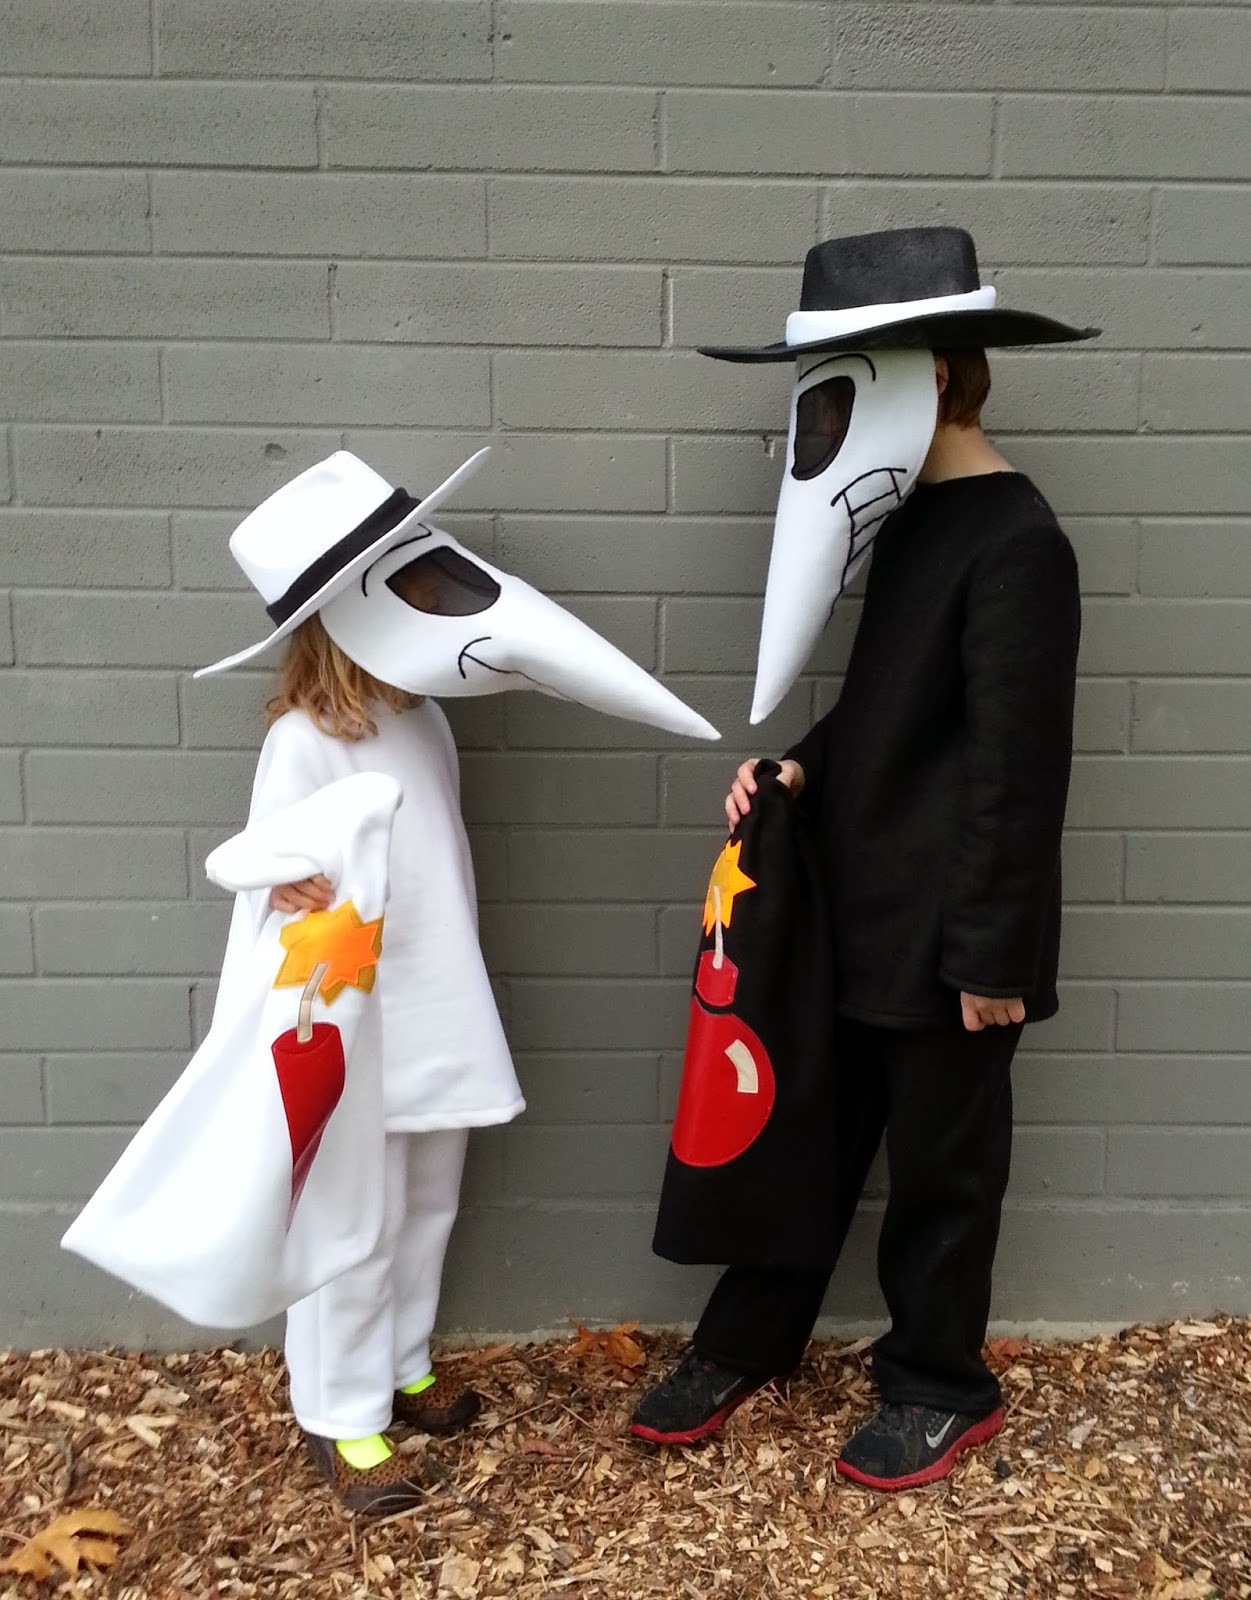 Spy Costume DIY  a patchwork world kokoleo style Spy vs Spy